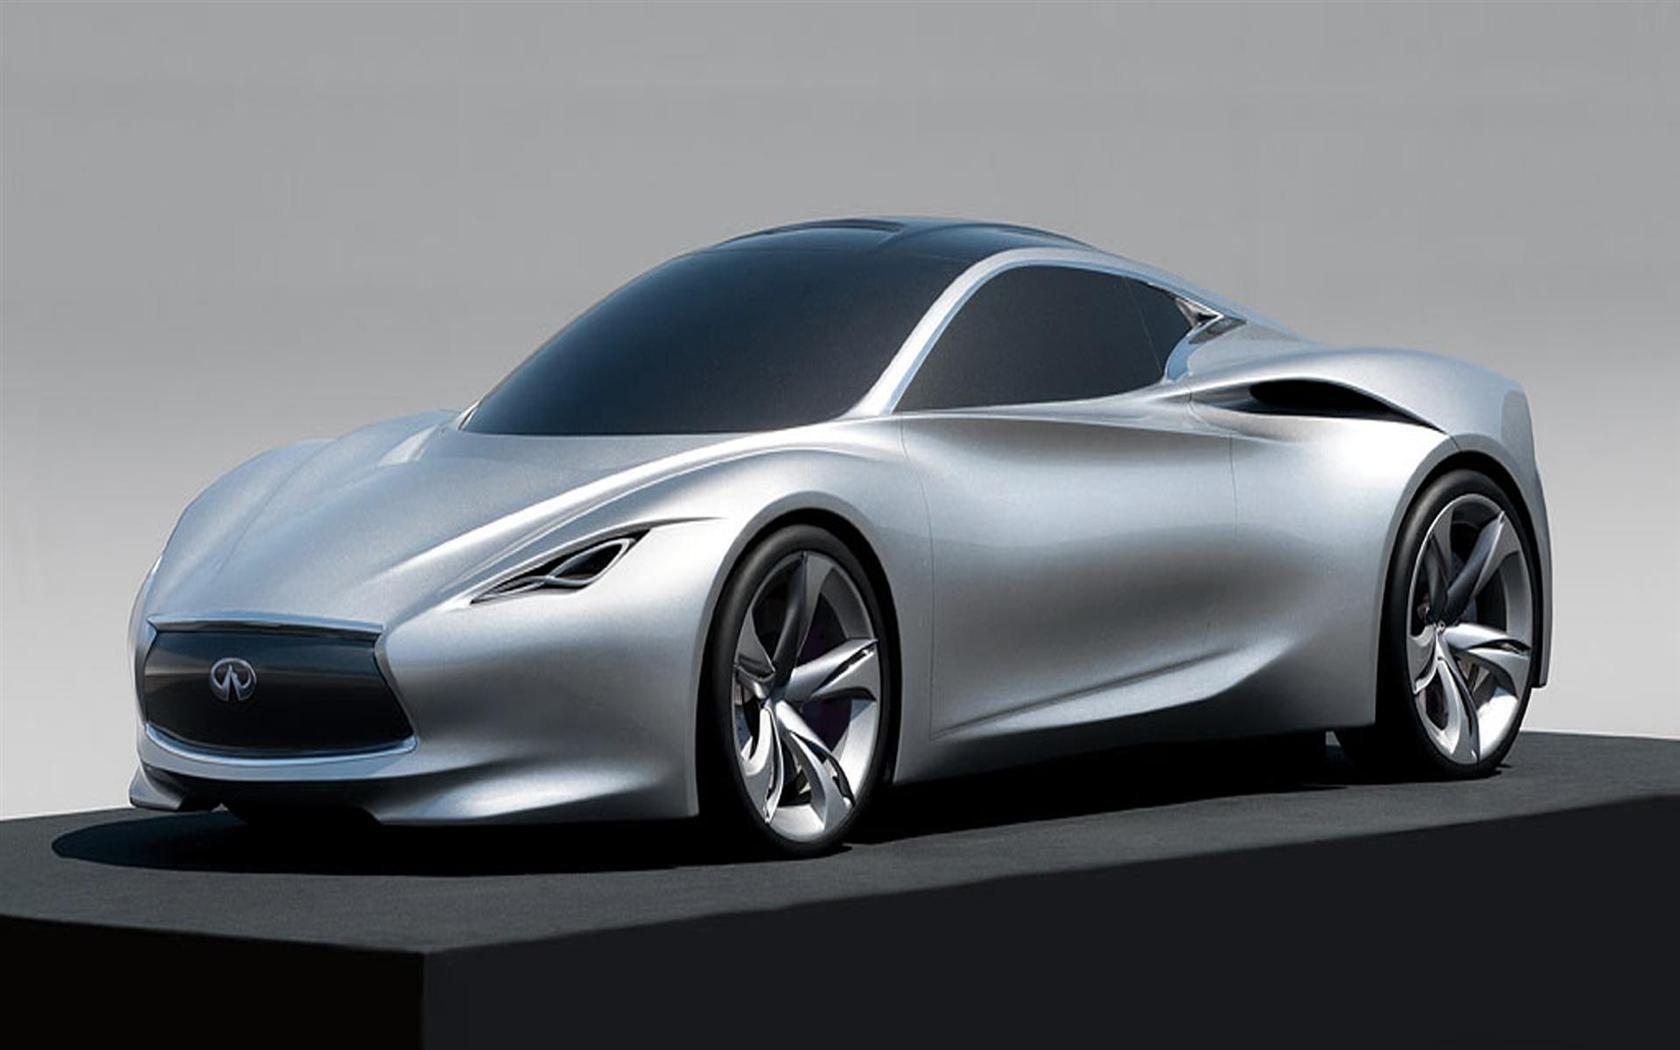 2010 Infiniti Emerg E Concept photo - 2